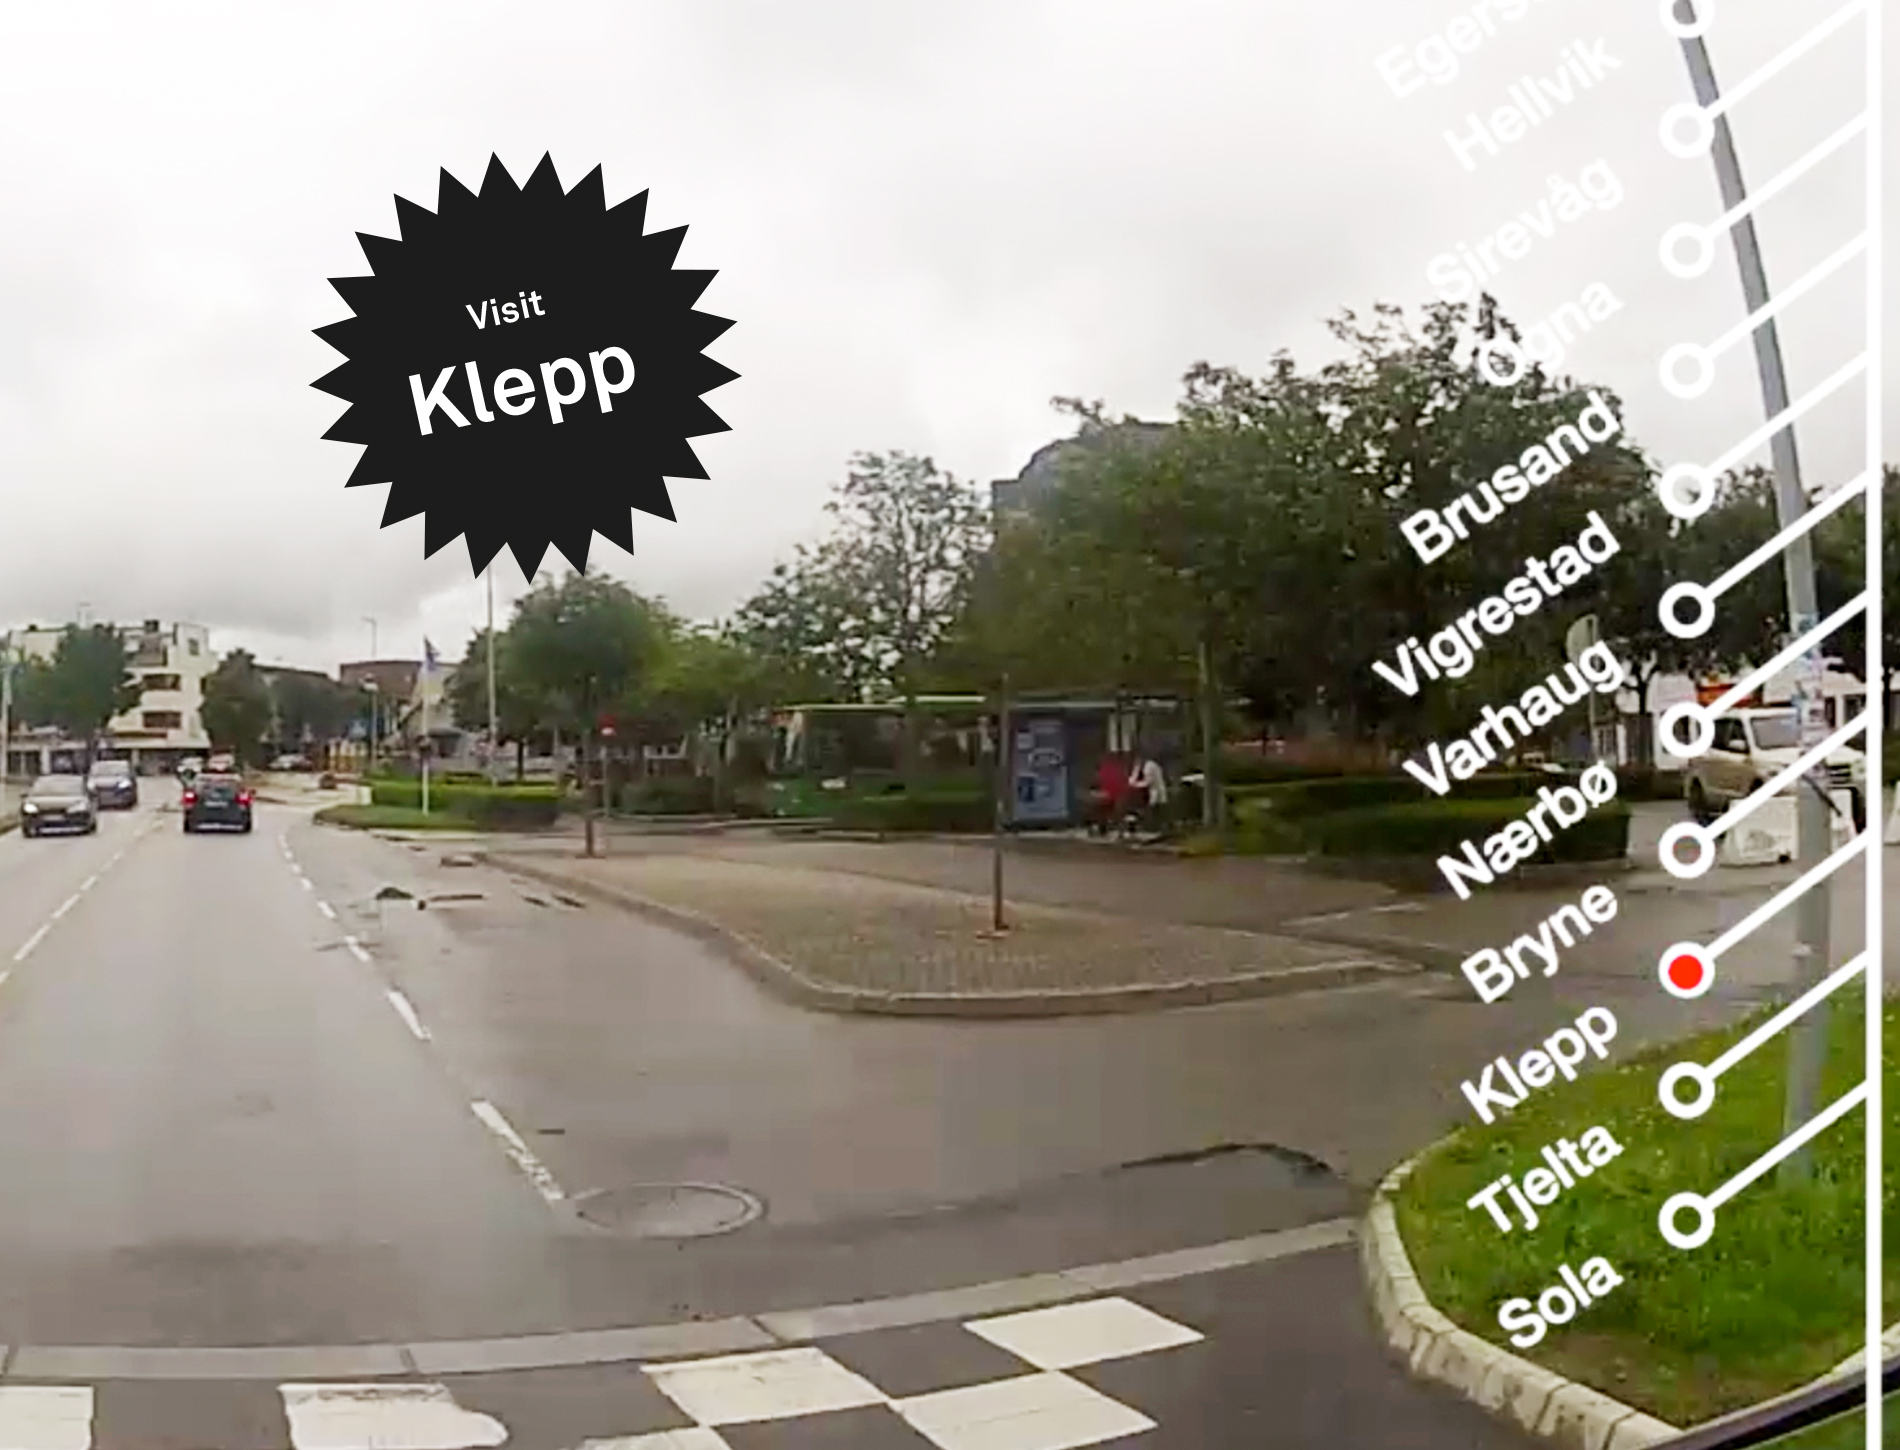 visit_klepp.jpg